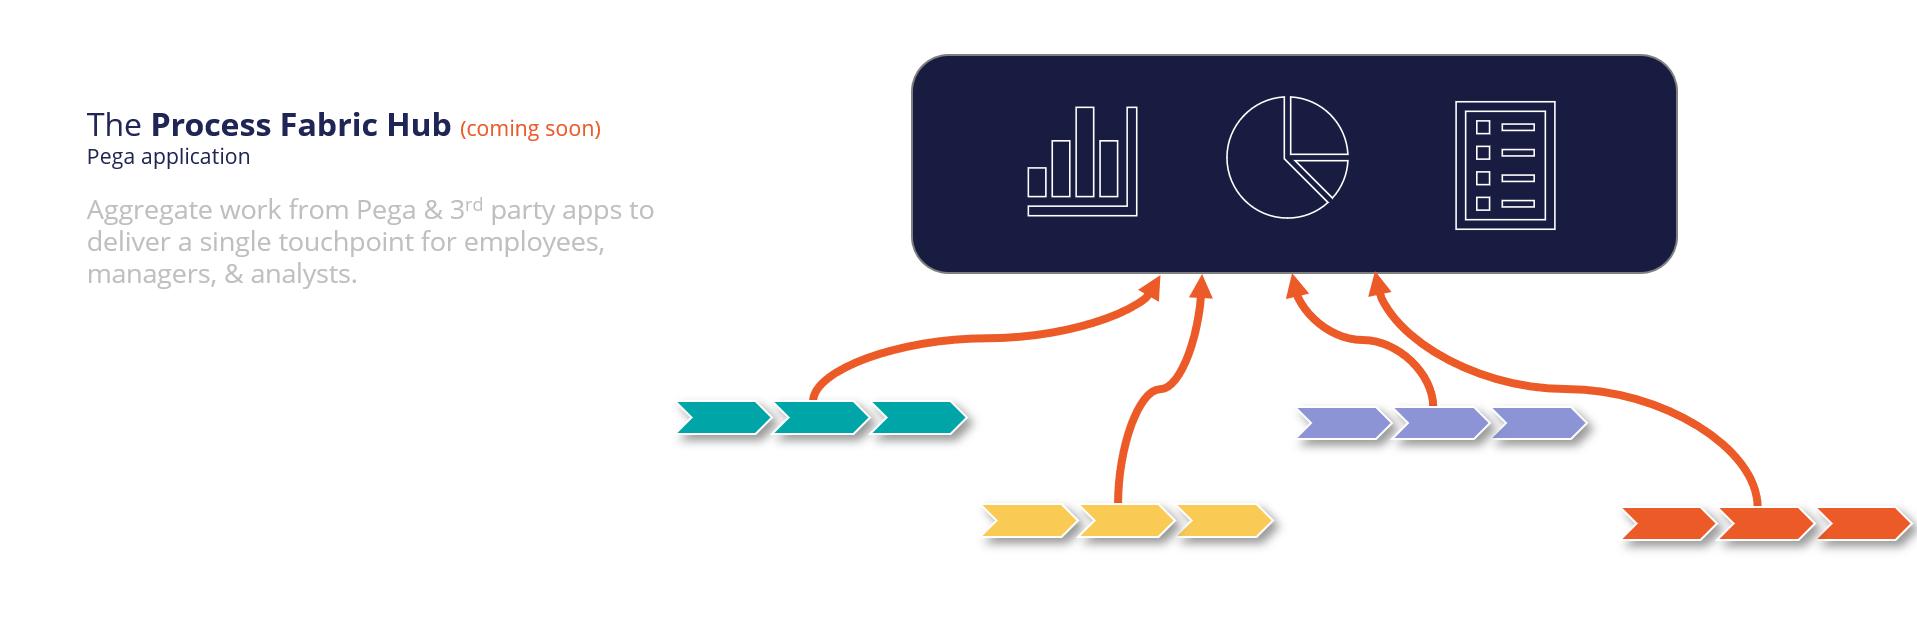 Process Fabric Hub